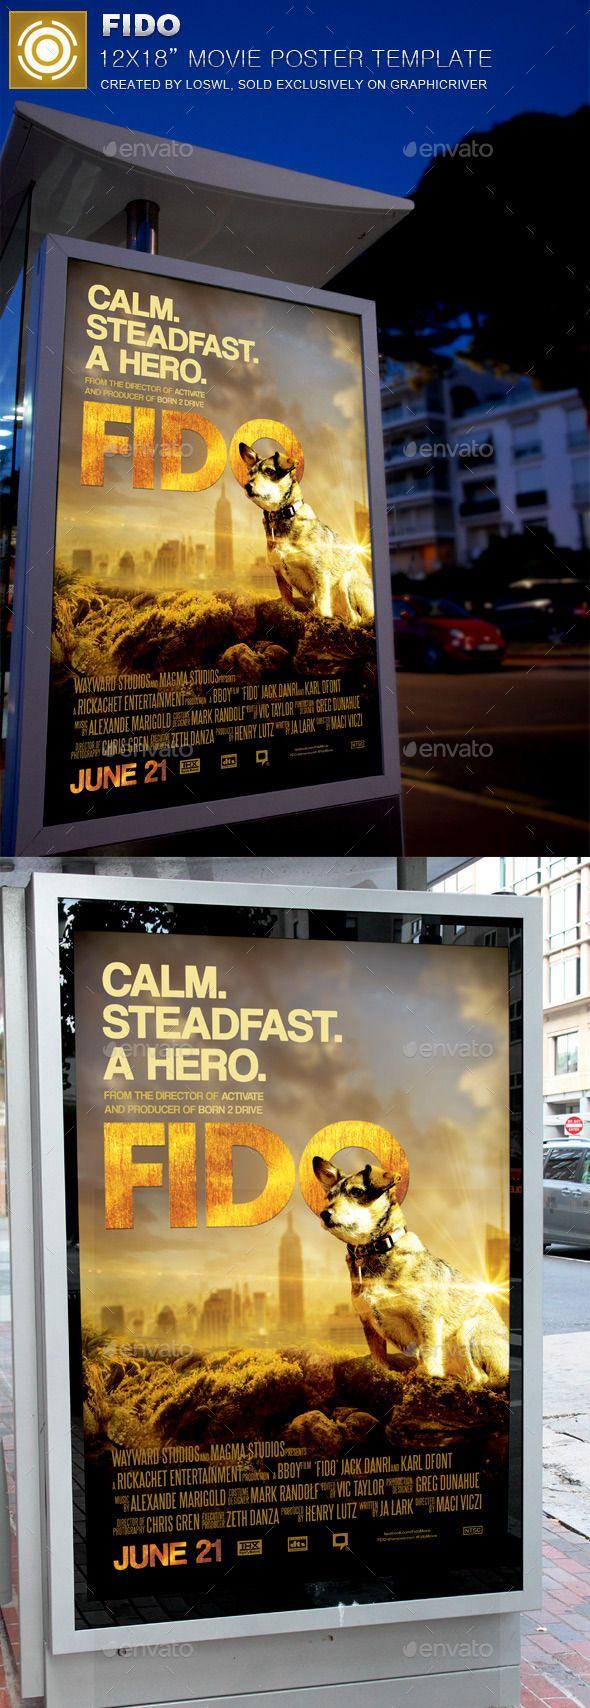 Fido Movie Poster Template